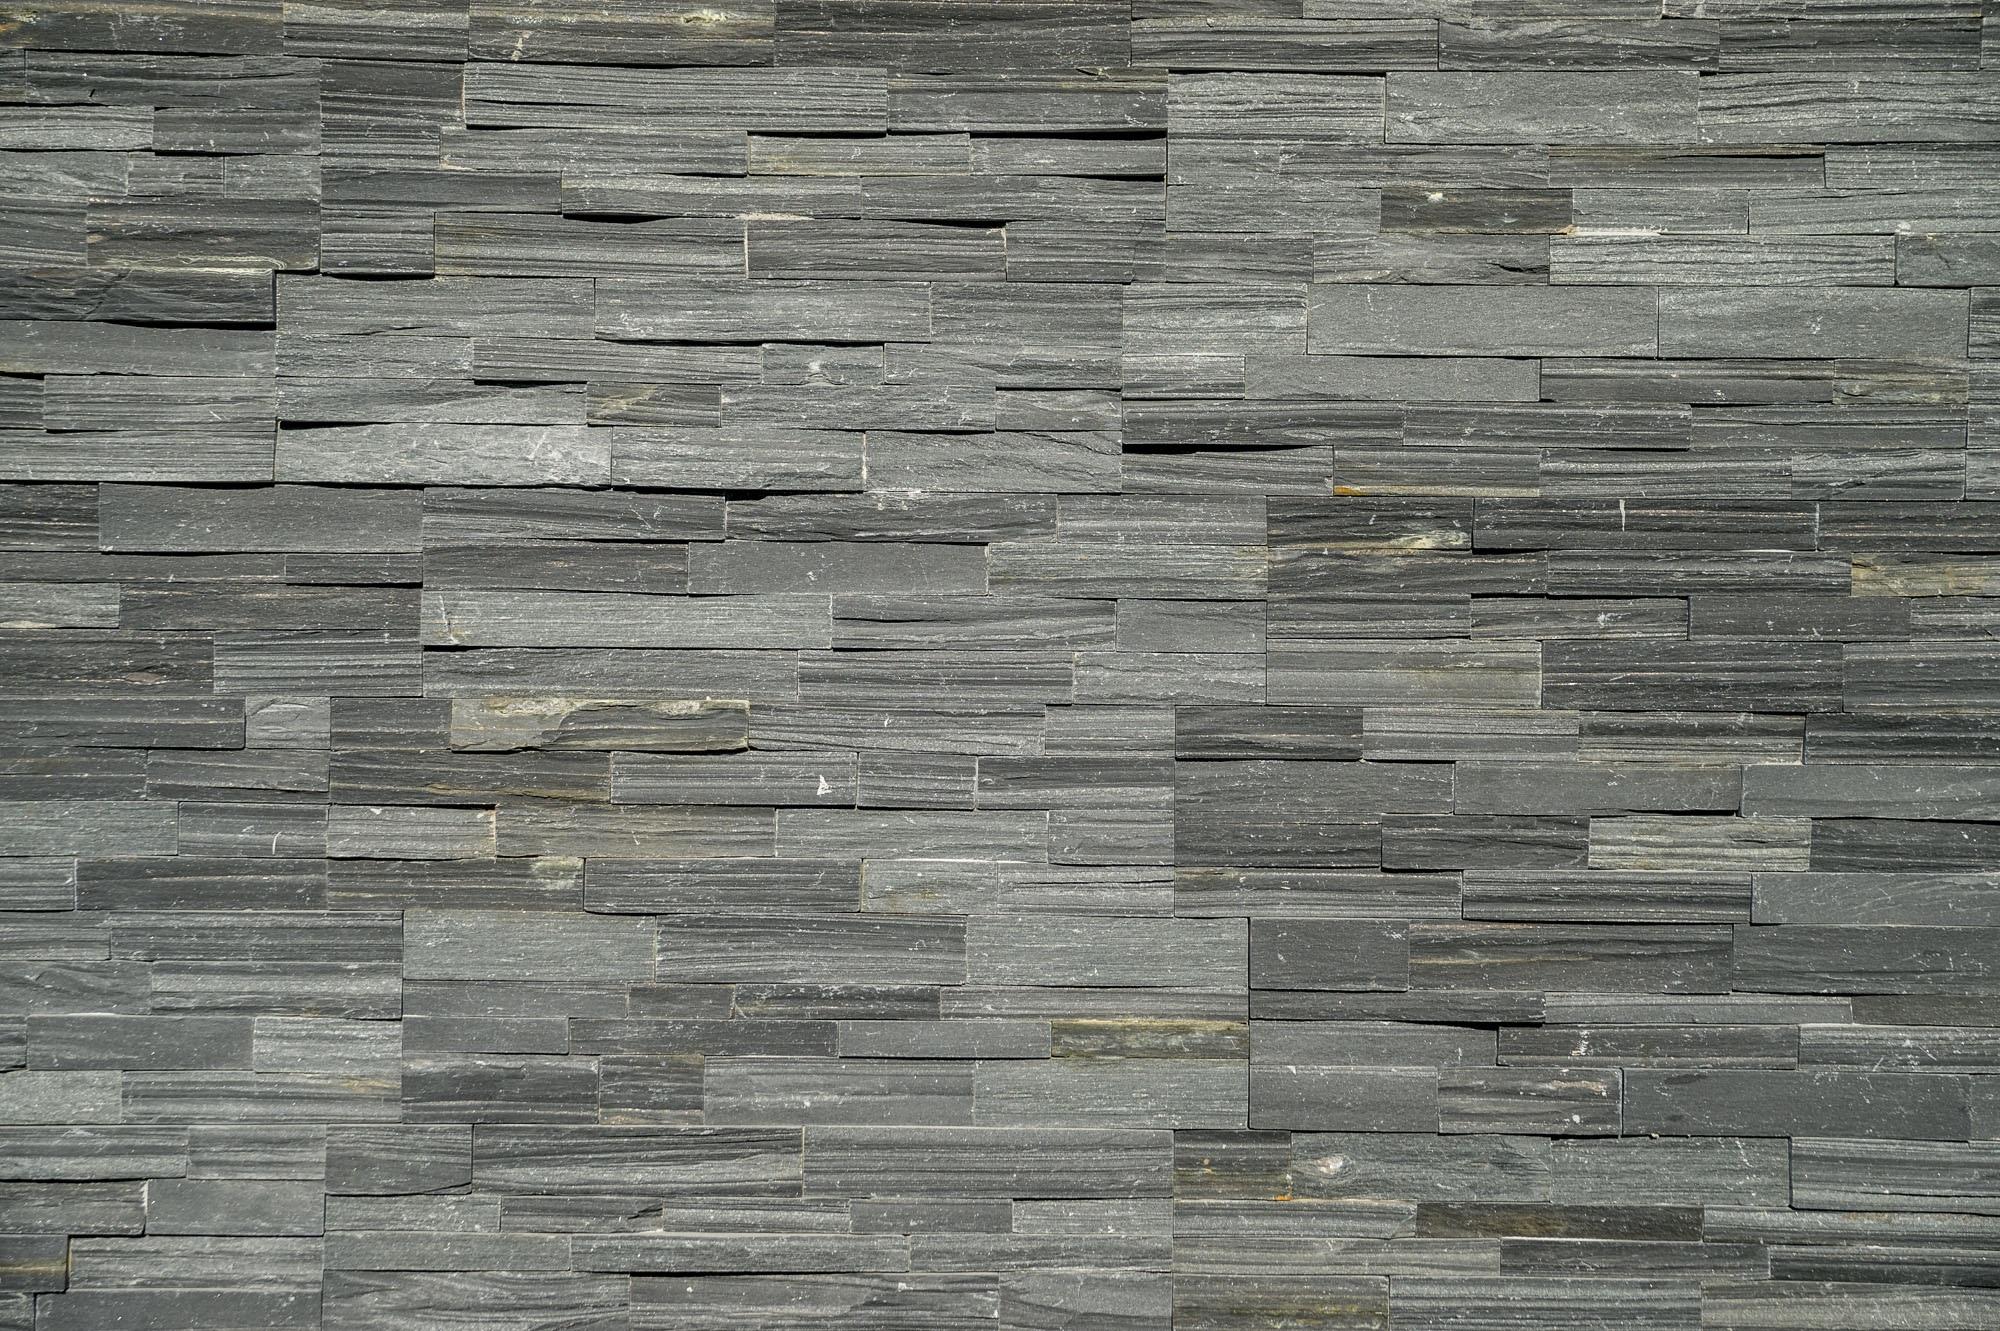 Fotos gratis textura piso pared azulejo pared de piedra negro ladrillo material - Textura pared ...